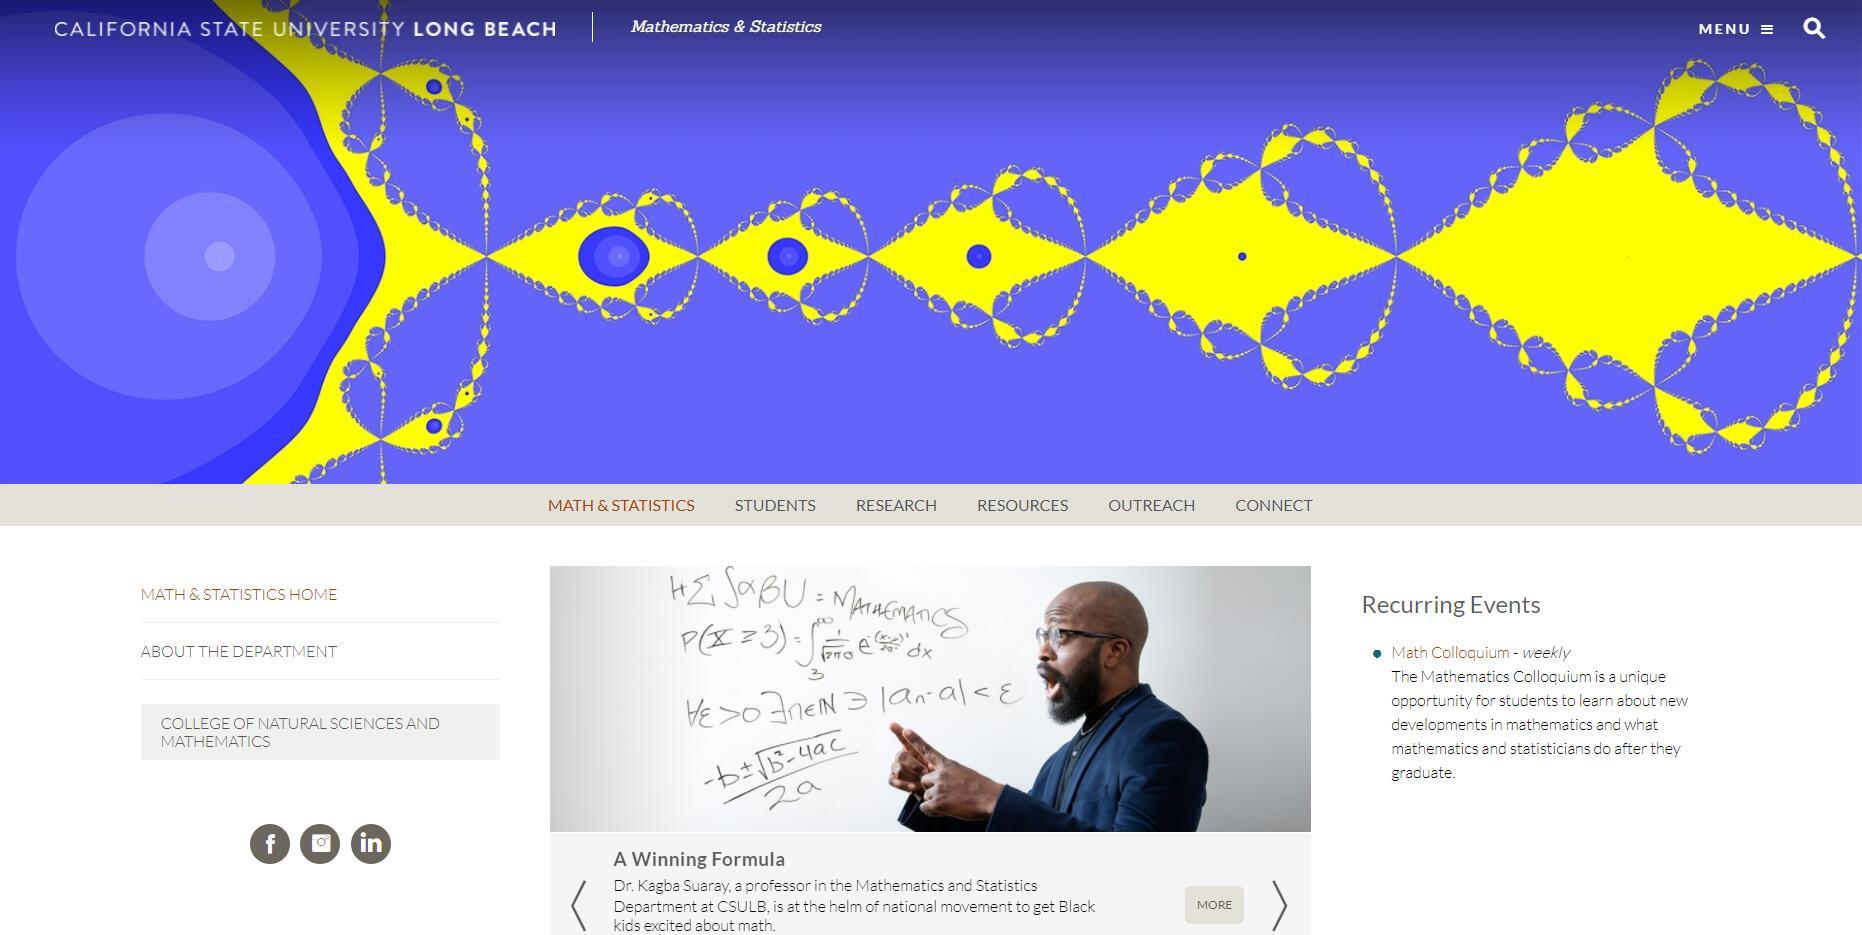 CSULB Mathematics & Statistics